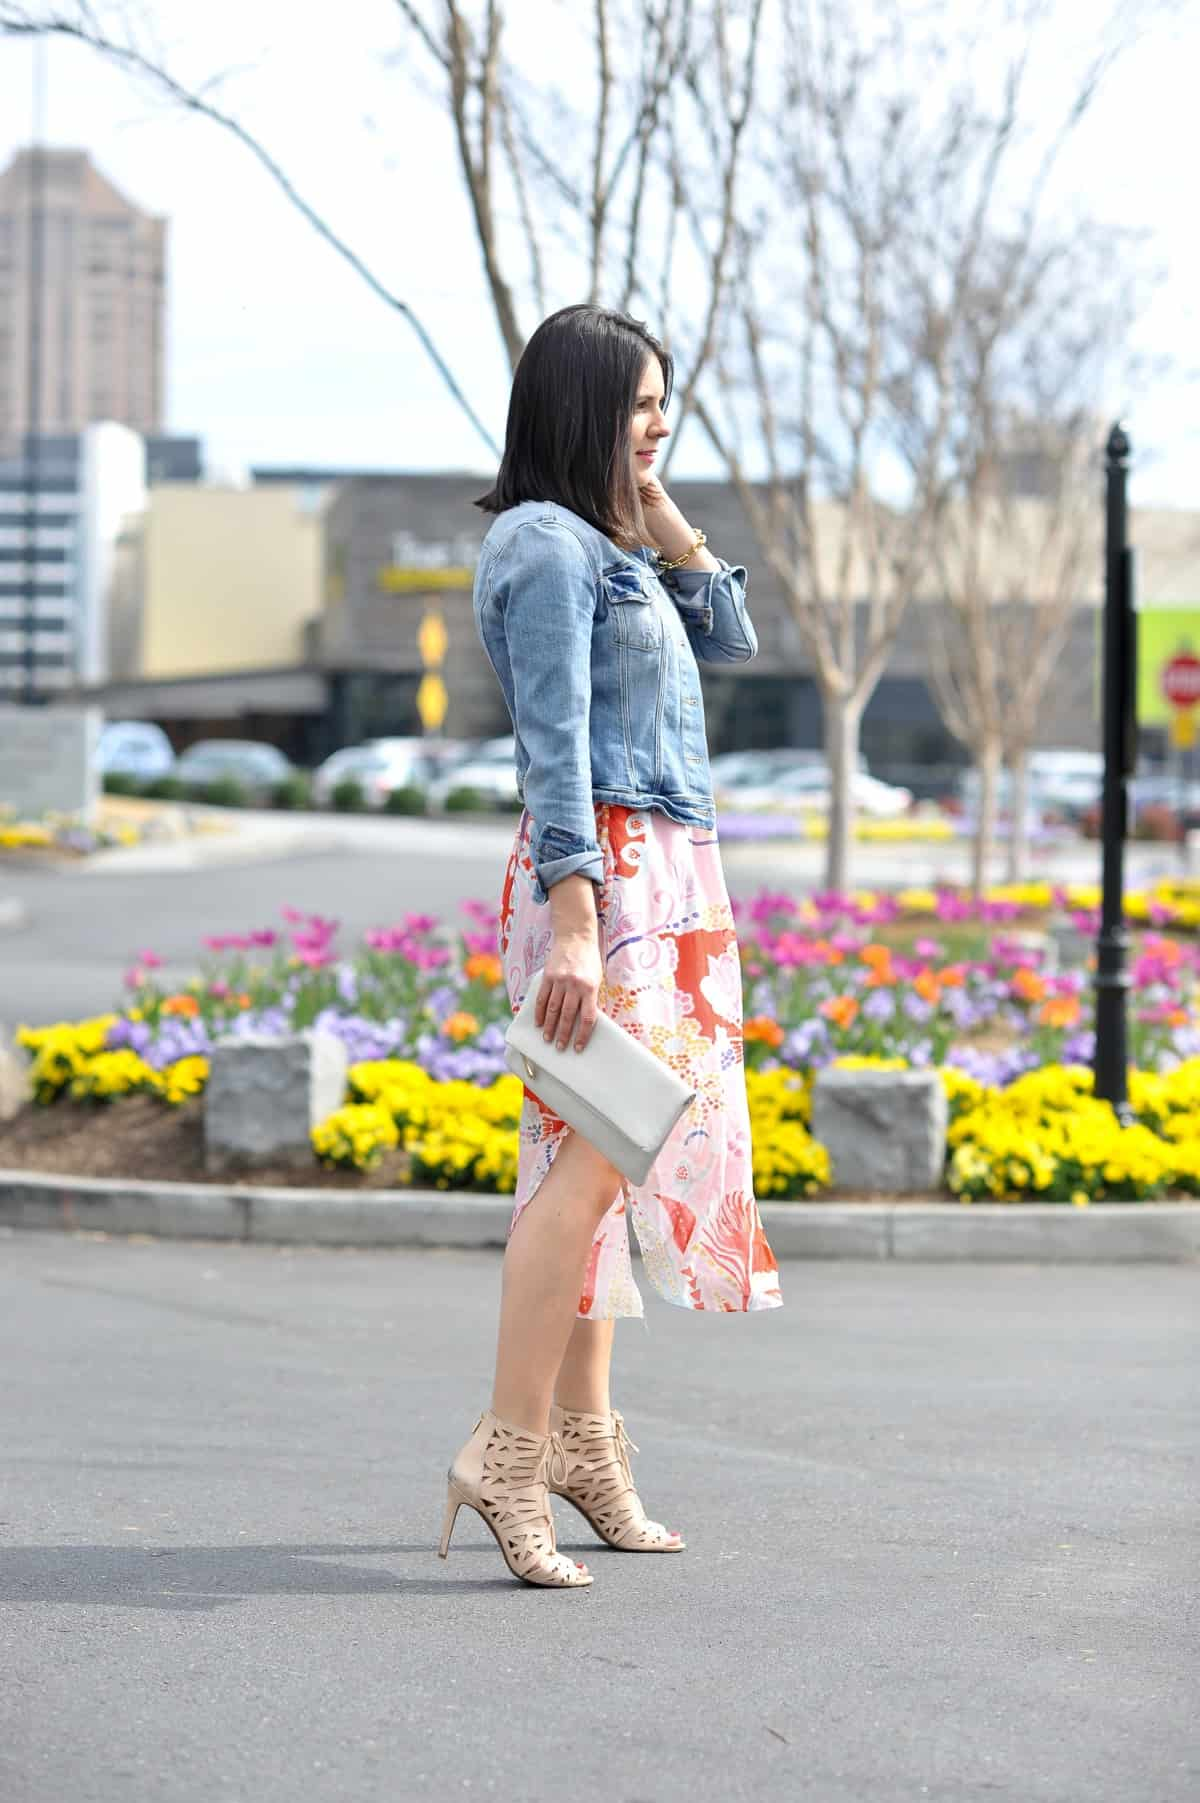 Banjanan Cochella Dress - printed floral dress for summer - My Style Vita - @mystylevita - 5